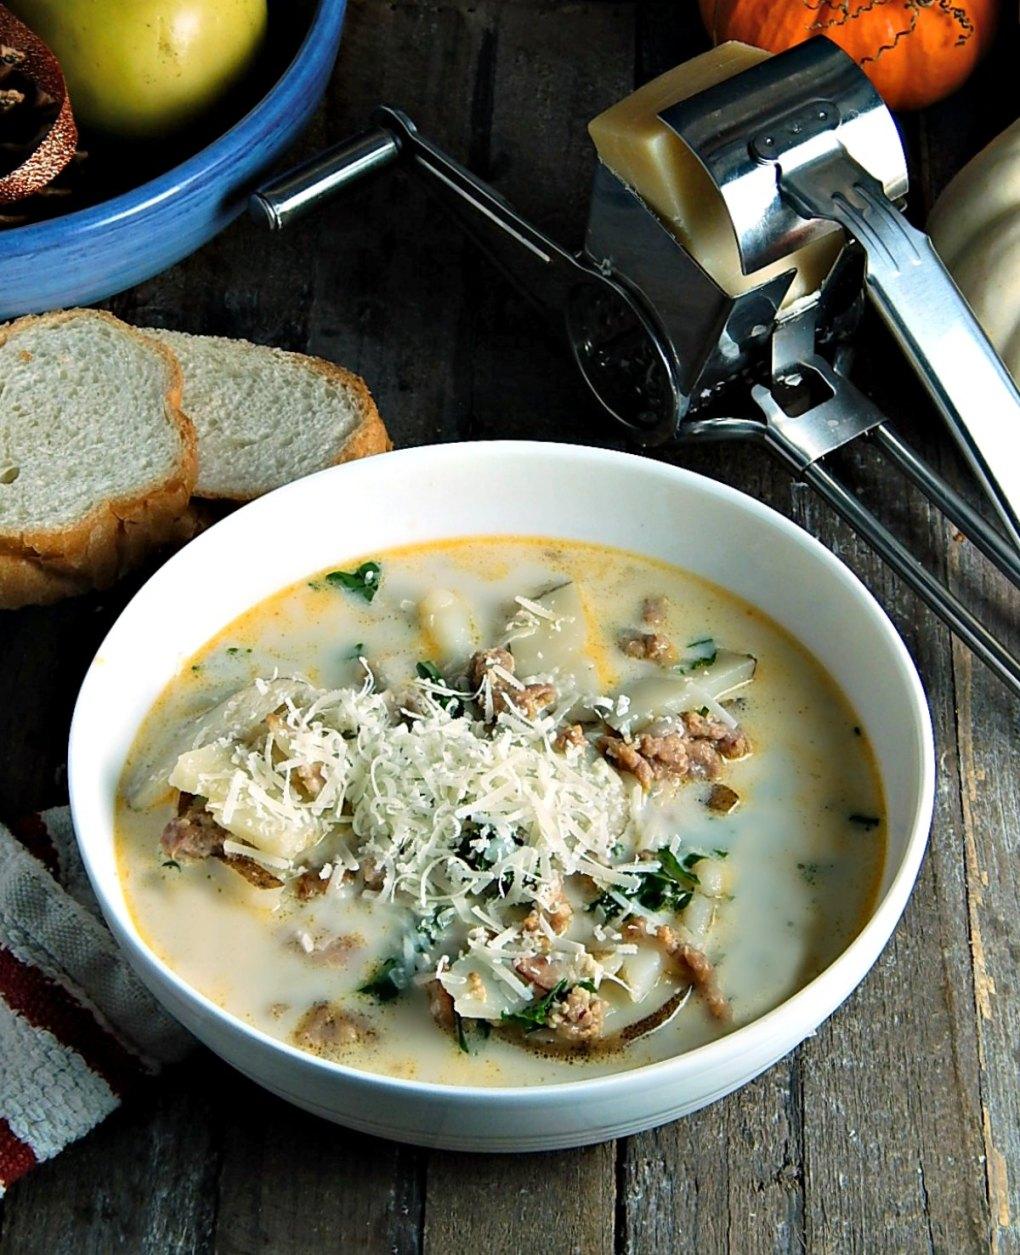 Olive Garden's Zuppa Toscana Copycat